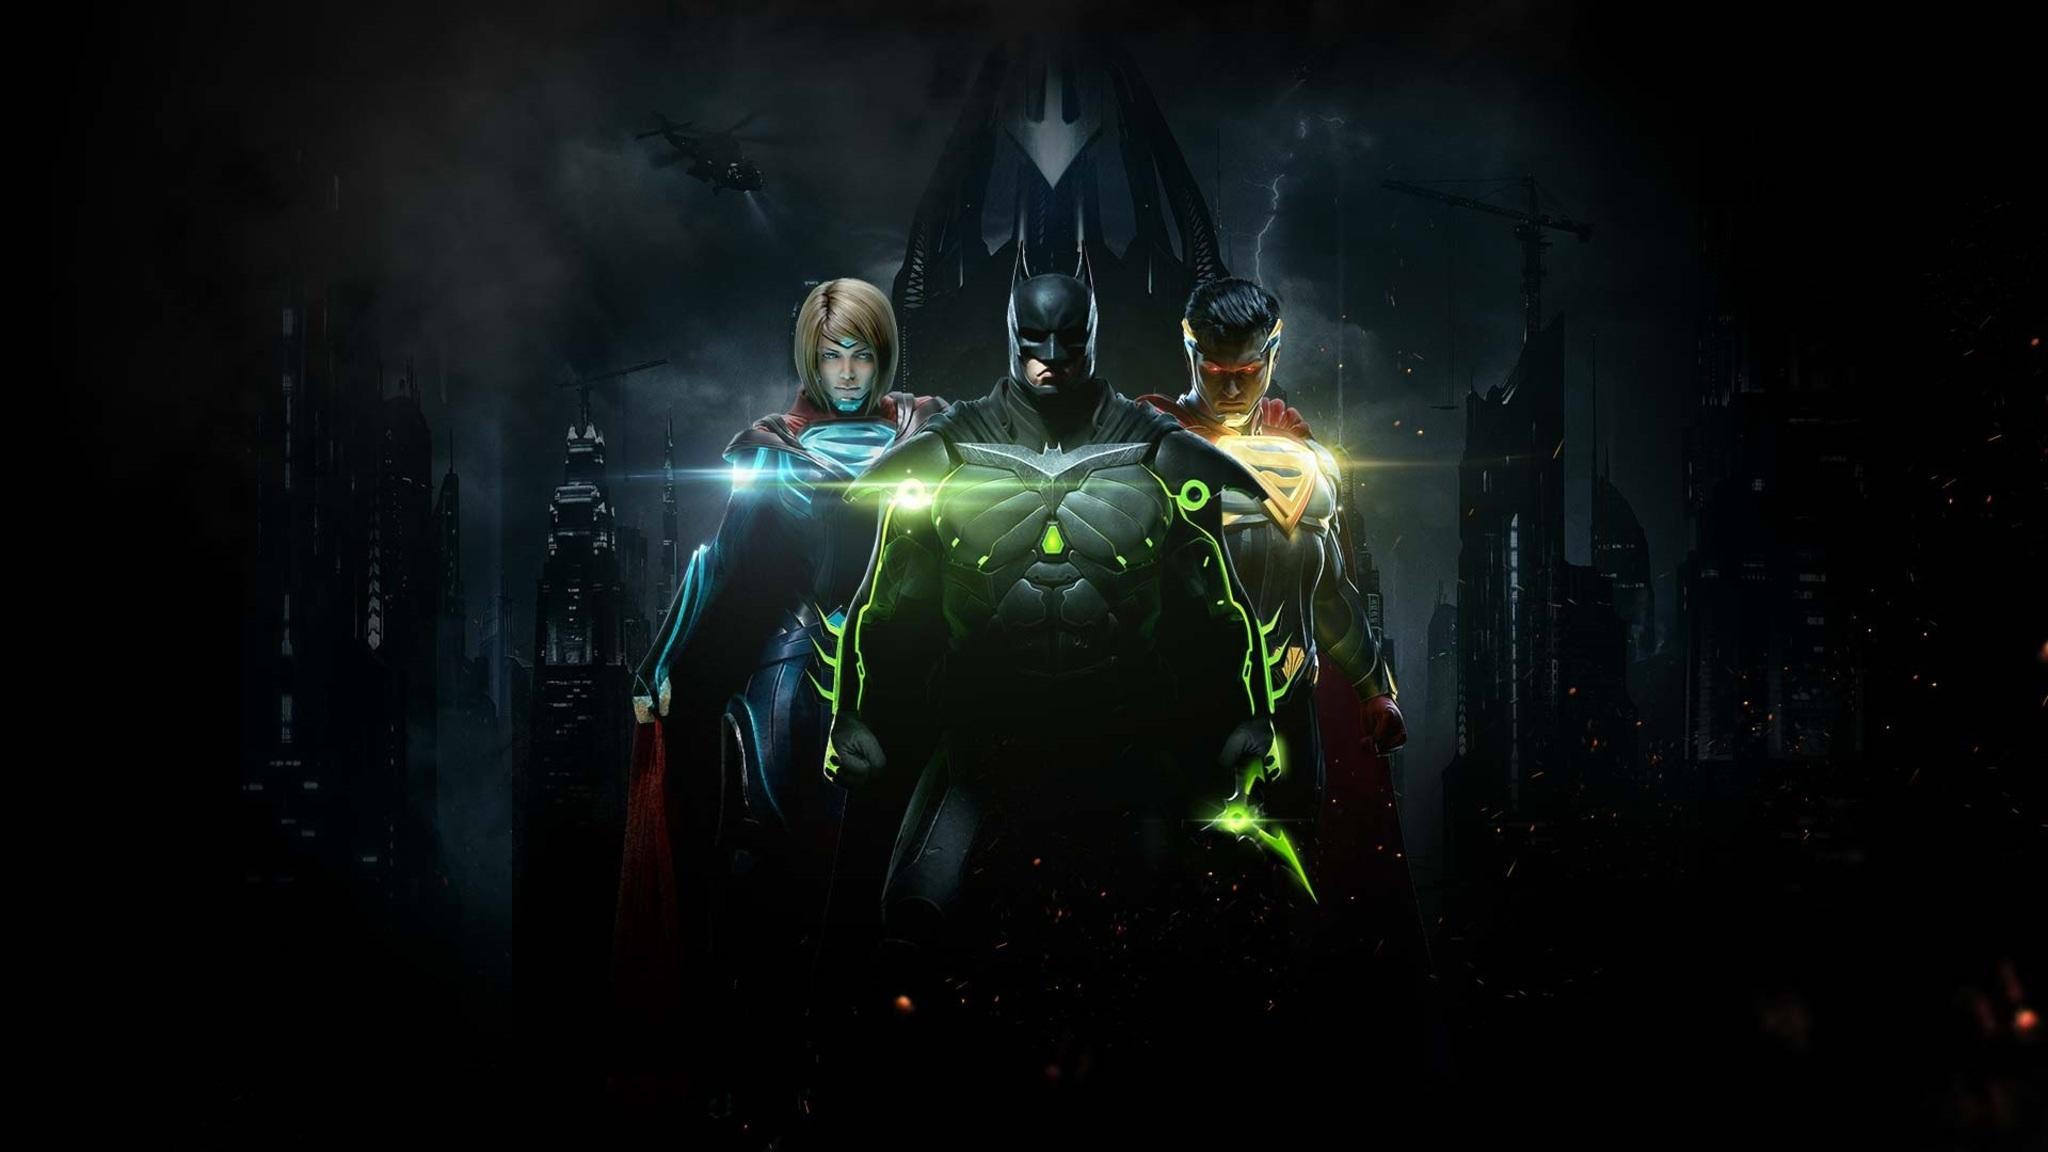 Injustice 2 Superman Hd Games 4k Wallpapers Images: 2048x1152 Injustice 2 Batman Superman And Supergirl